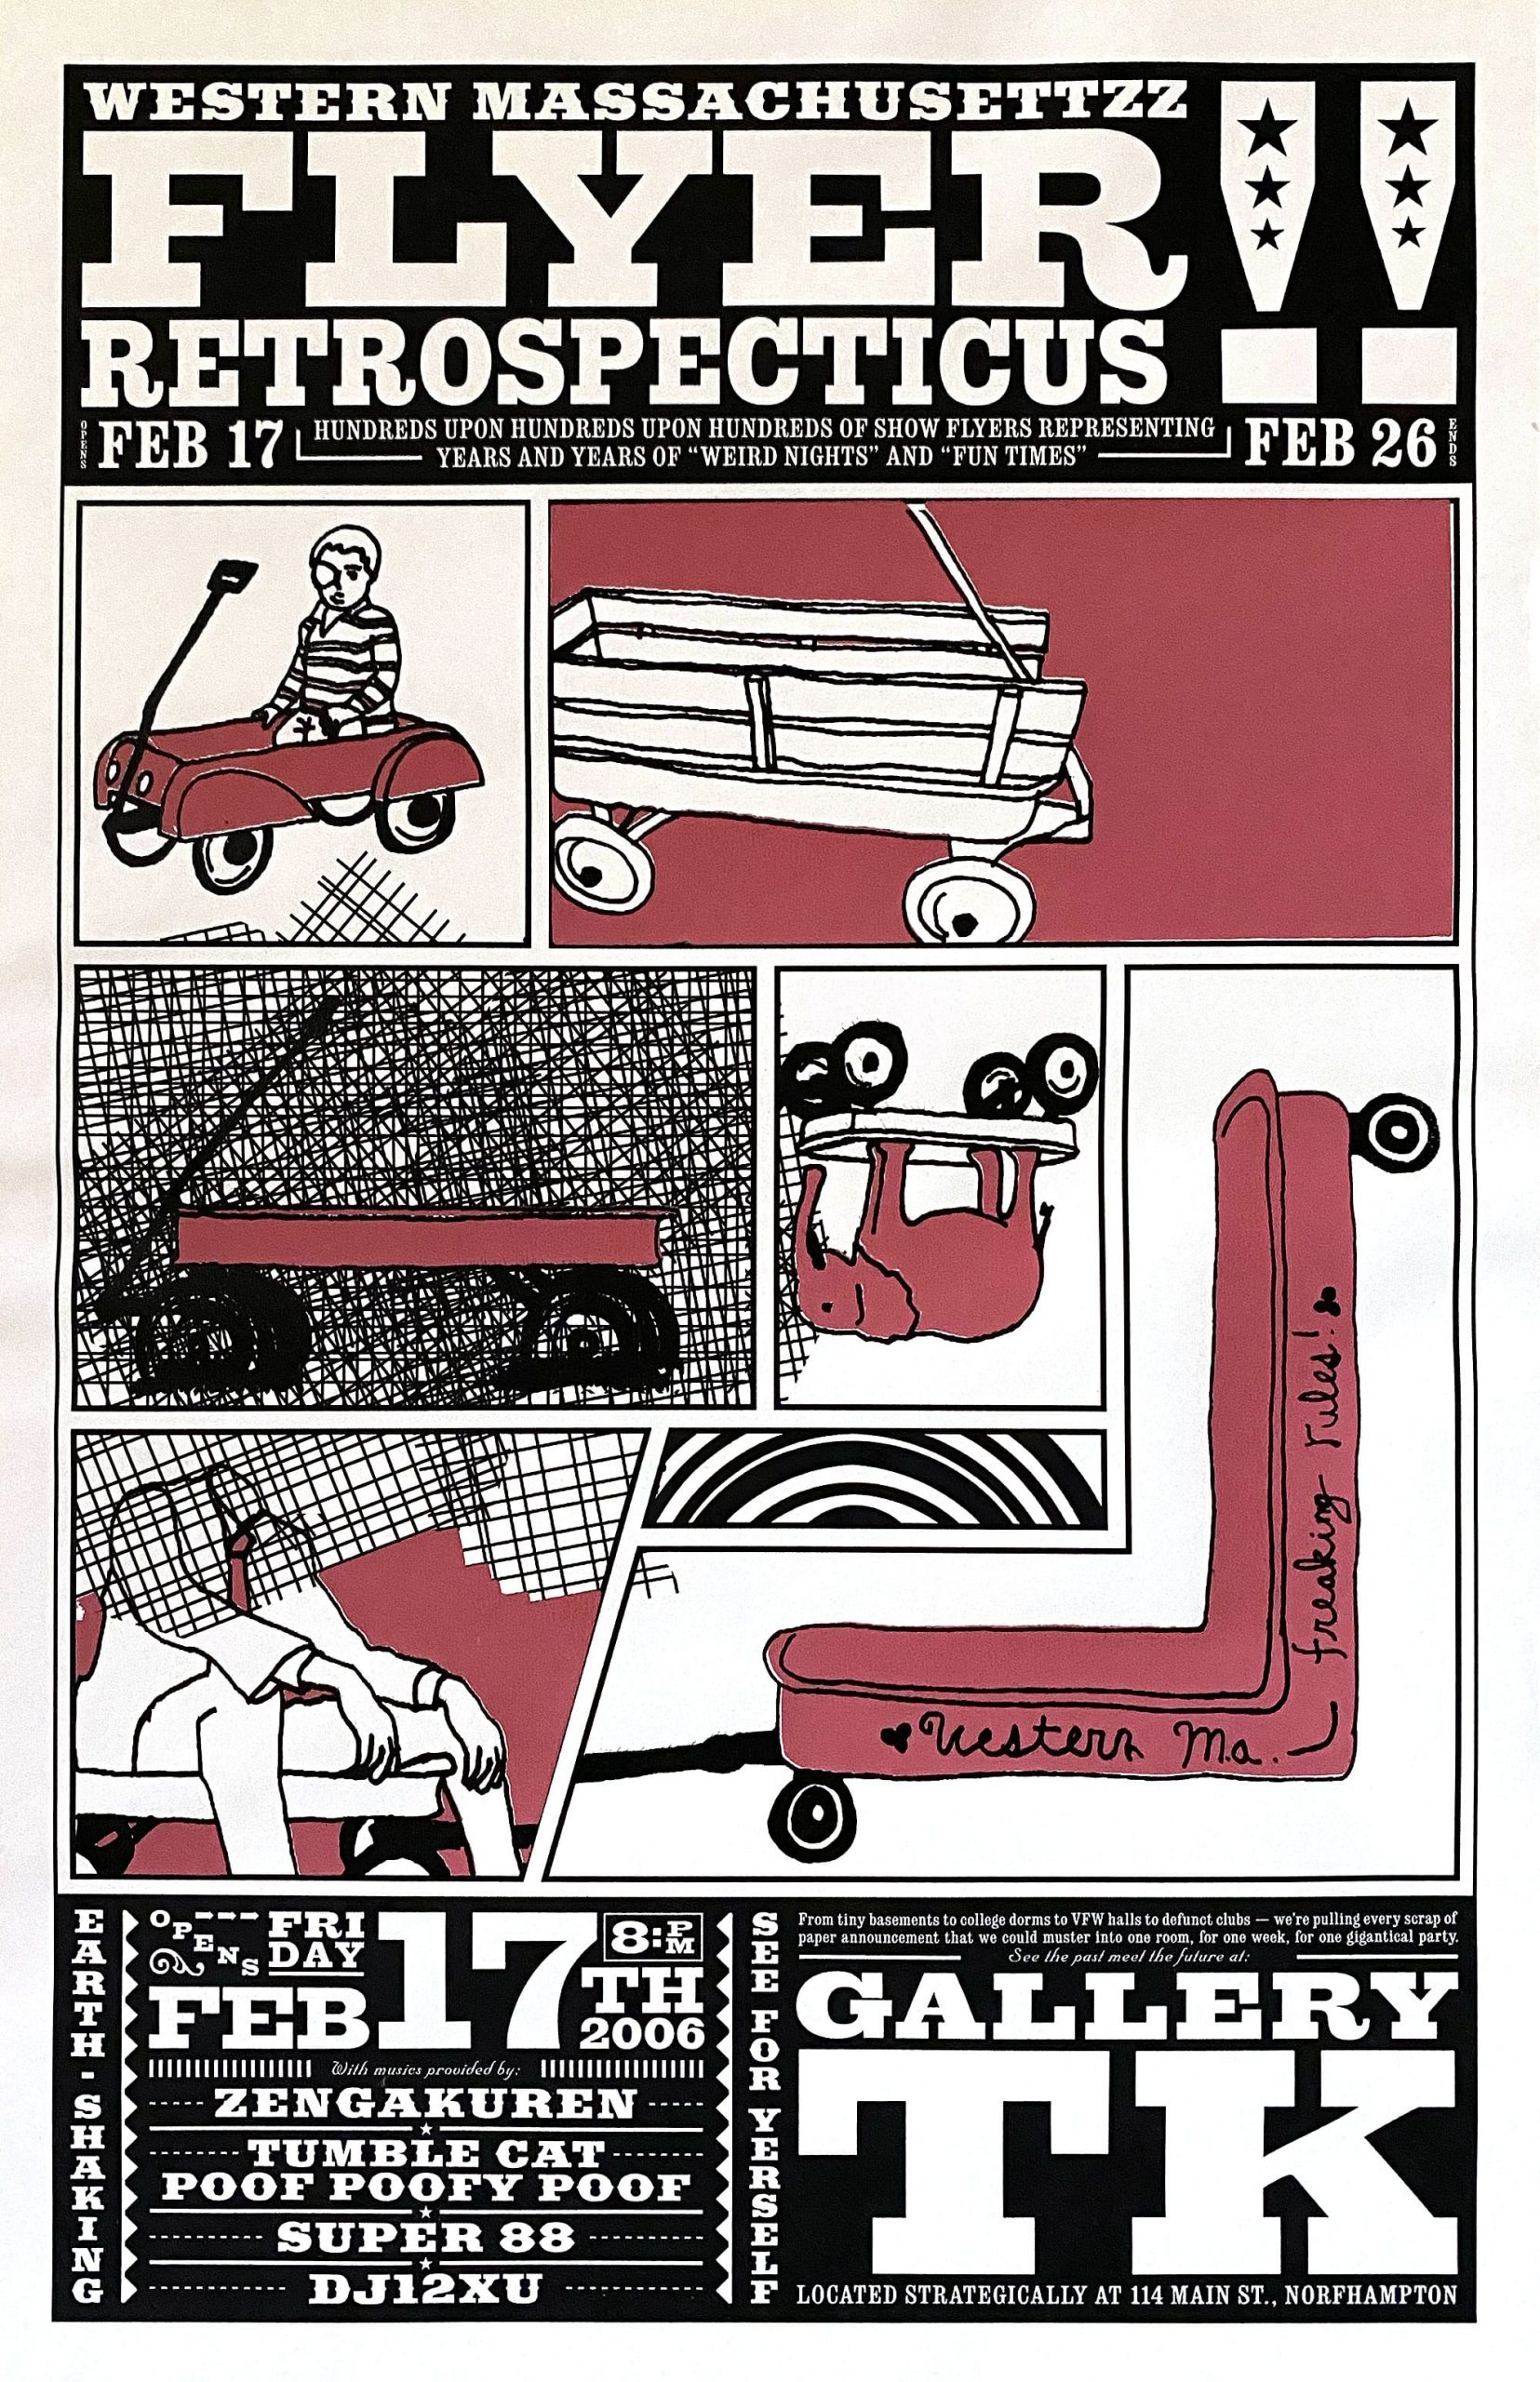 Illustrations by JP Boneyard